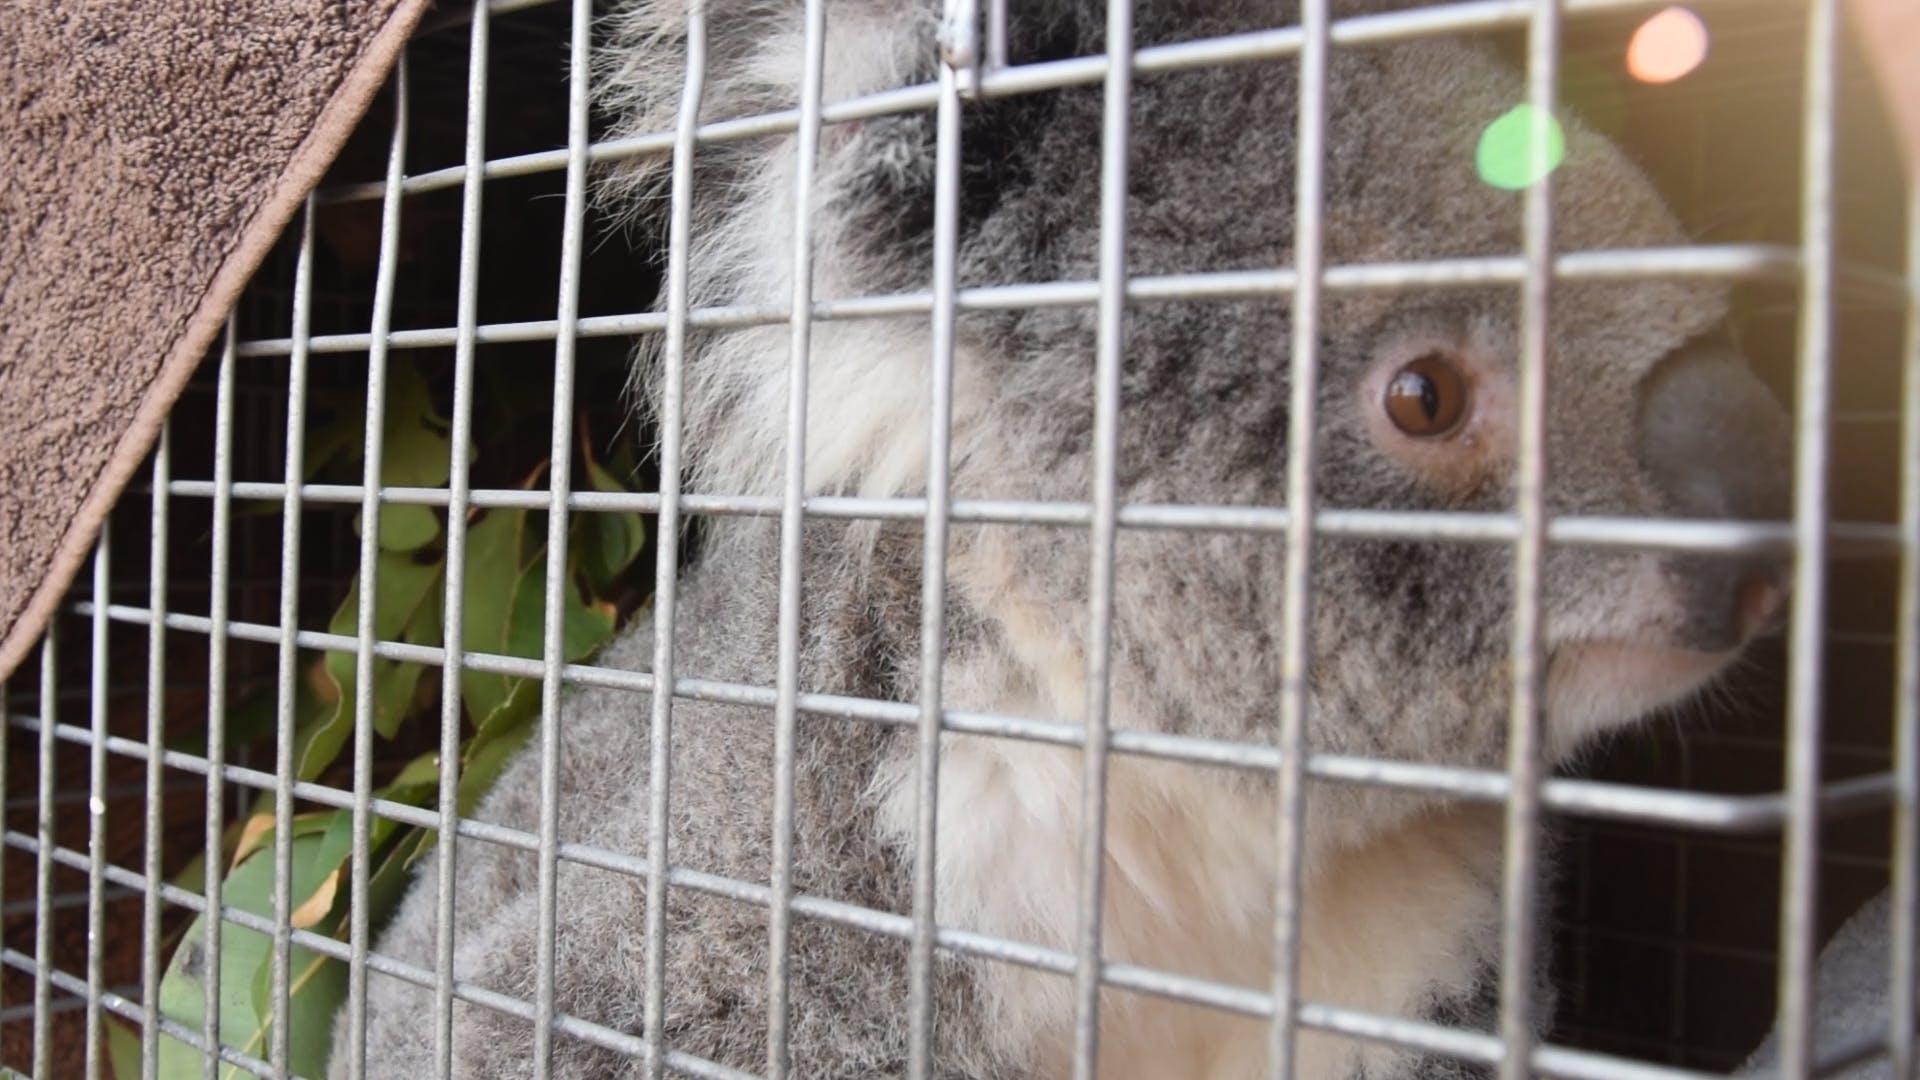 Miss Starry koala release (Image: Caragh Heenan)